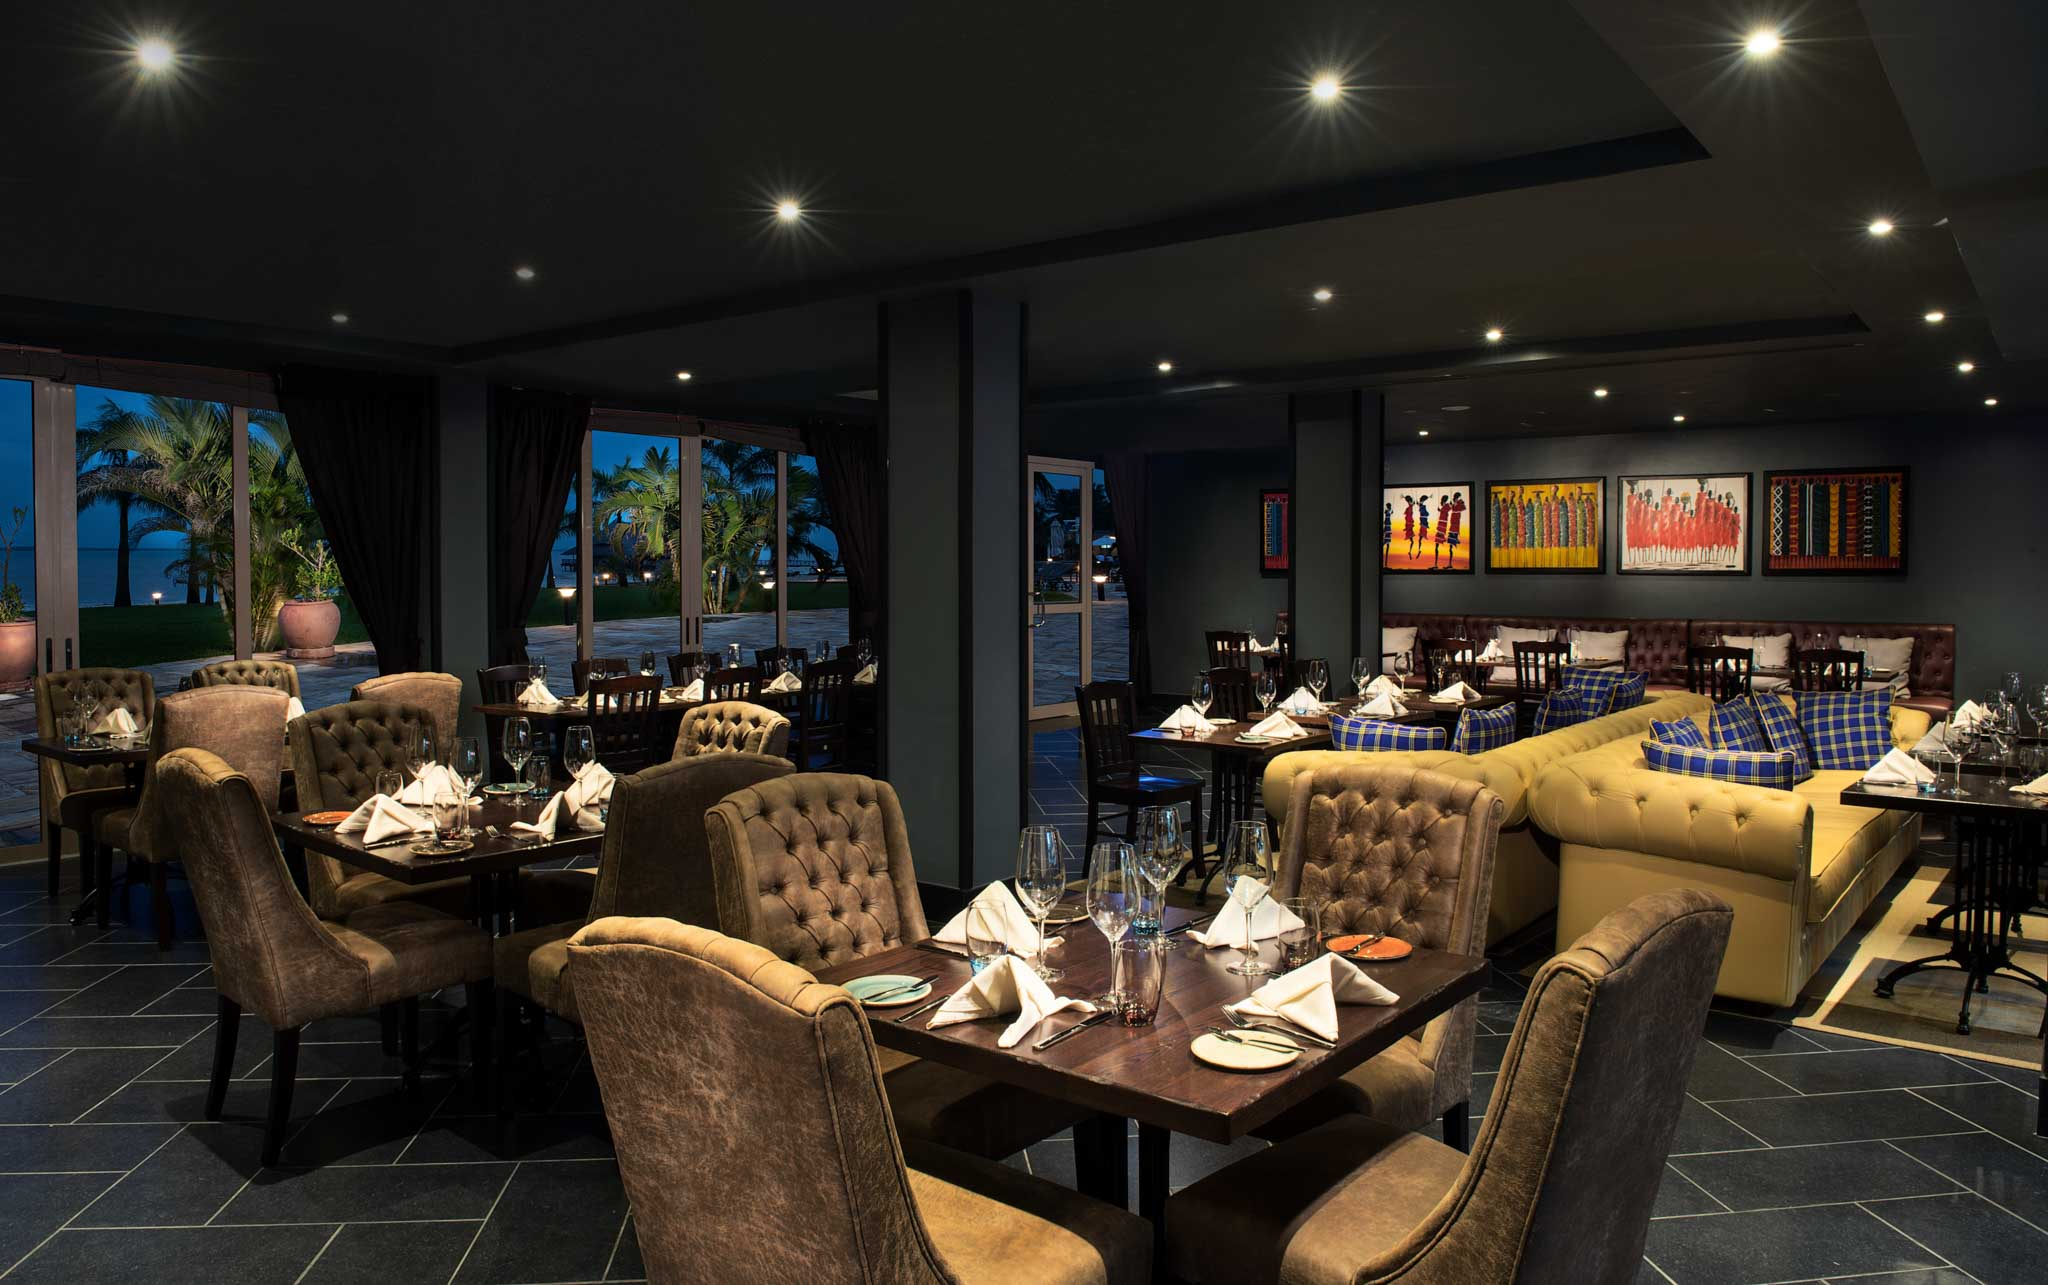 Hotel Photographer - Ramada Hotel Dar Es Salaam Dining